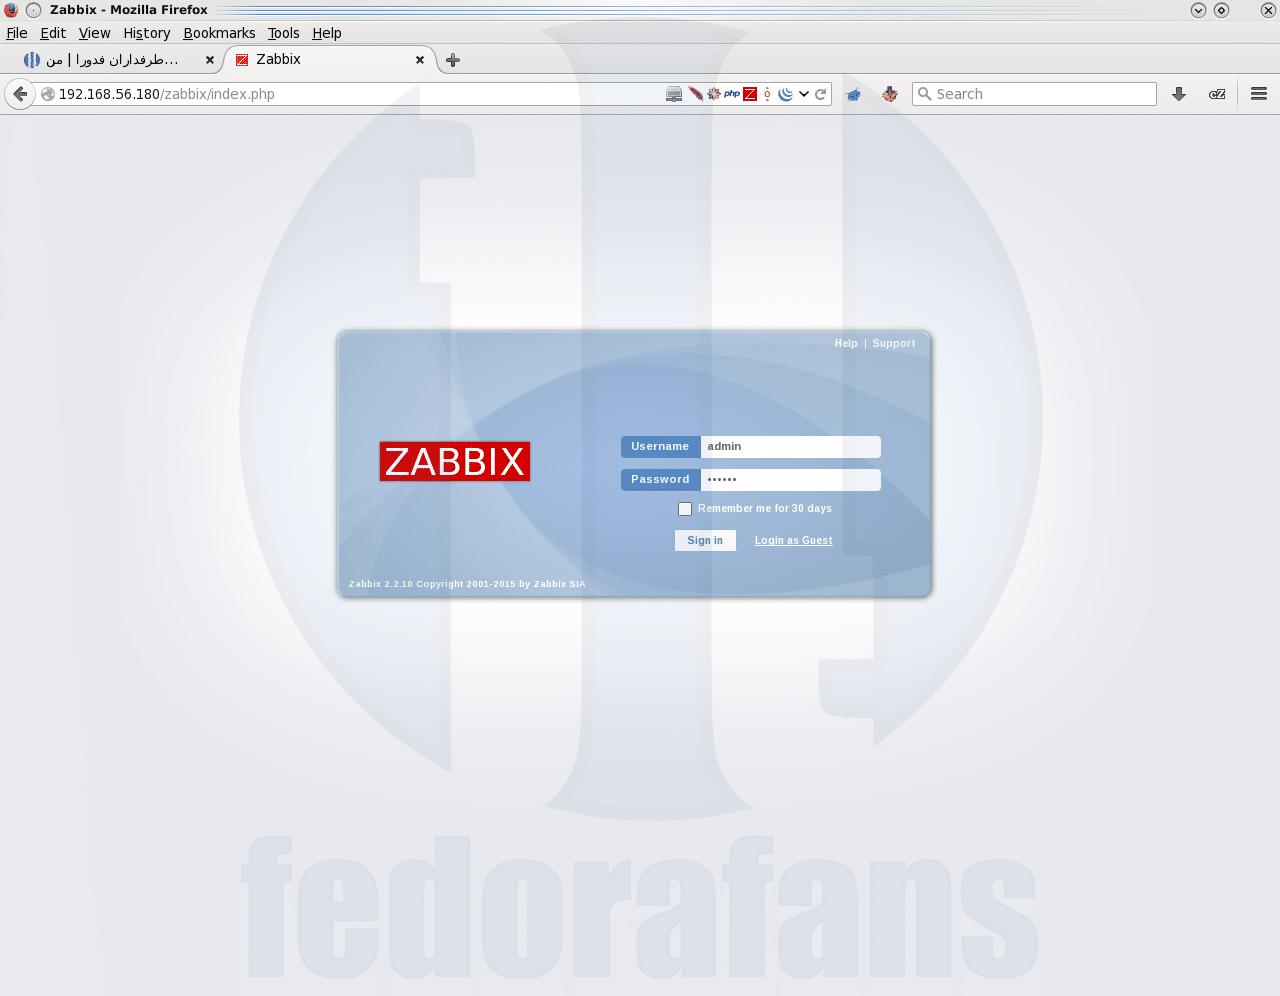 8-zabbix-fedorafans.com